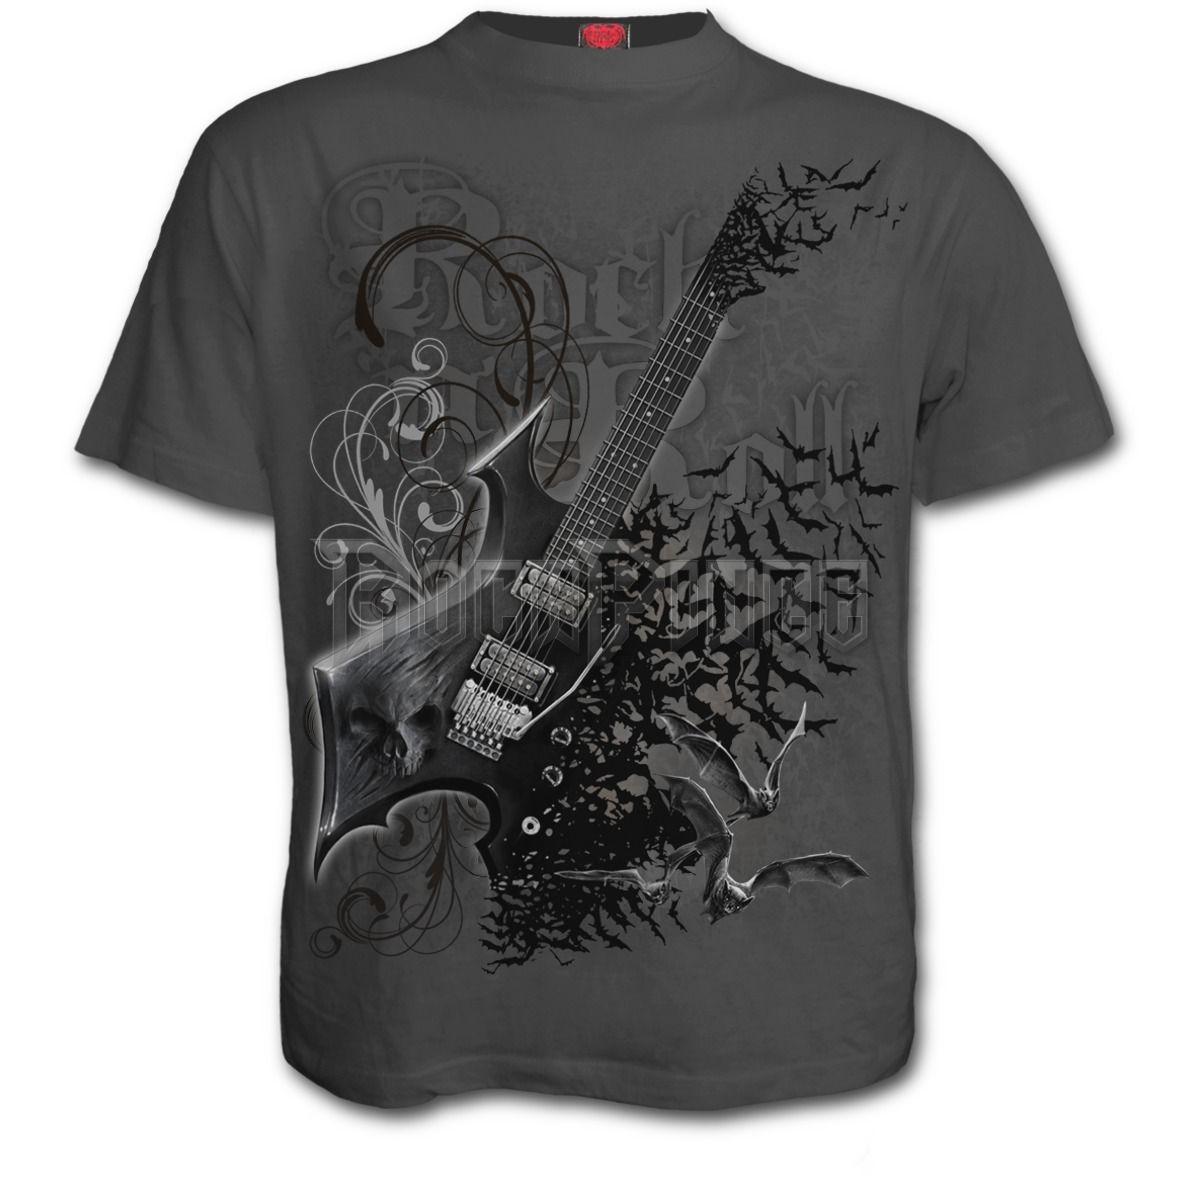 NIGHT RIFFS - T-Shirt Charcoal - E025M115